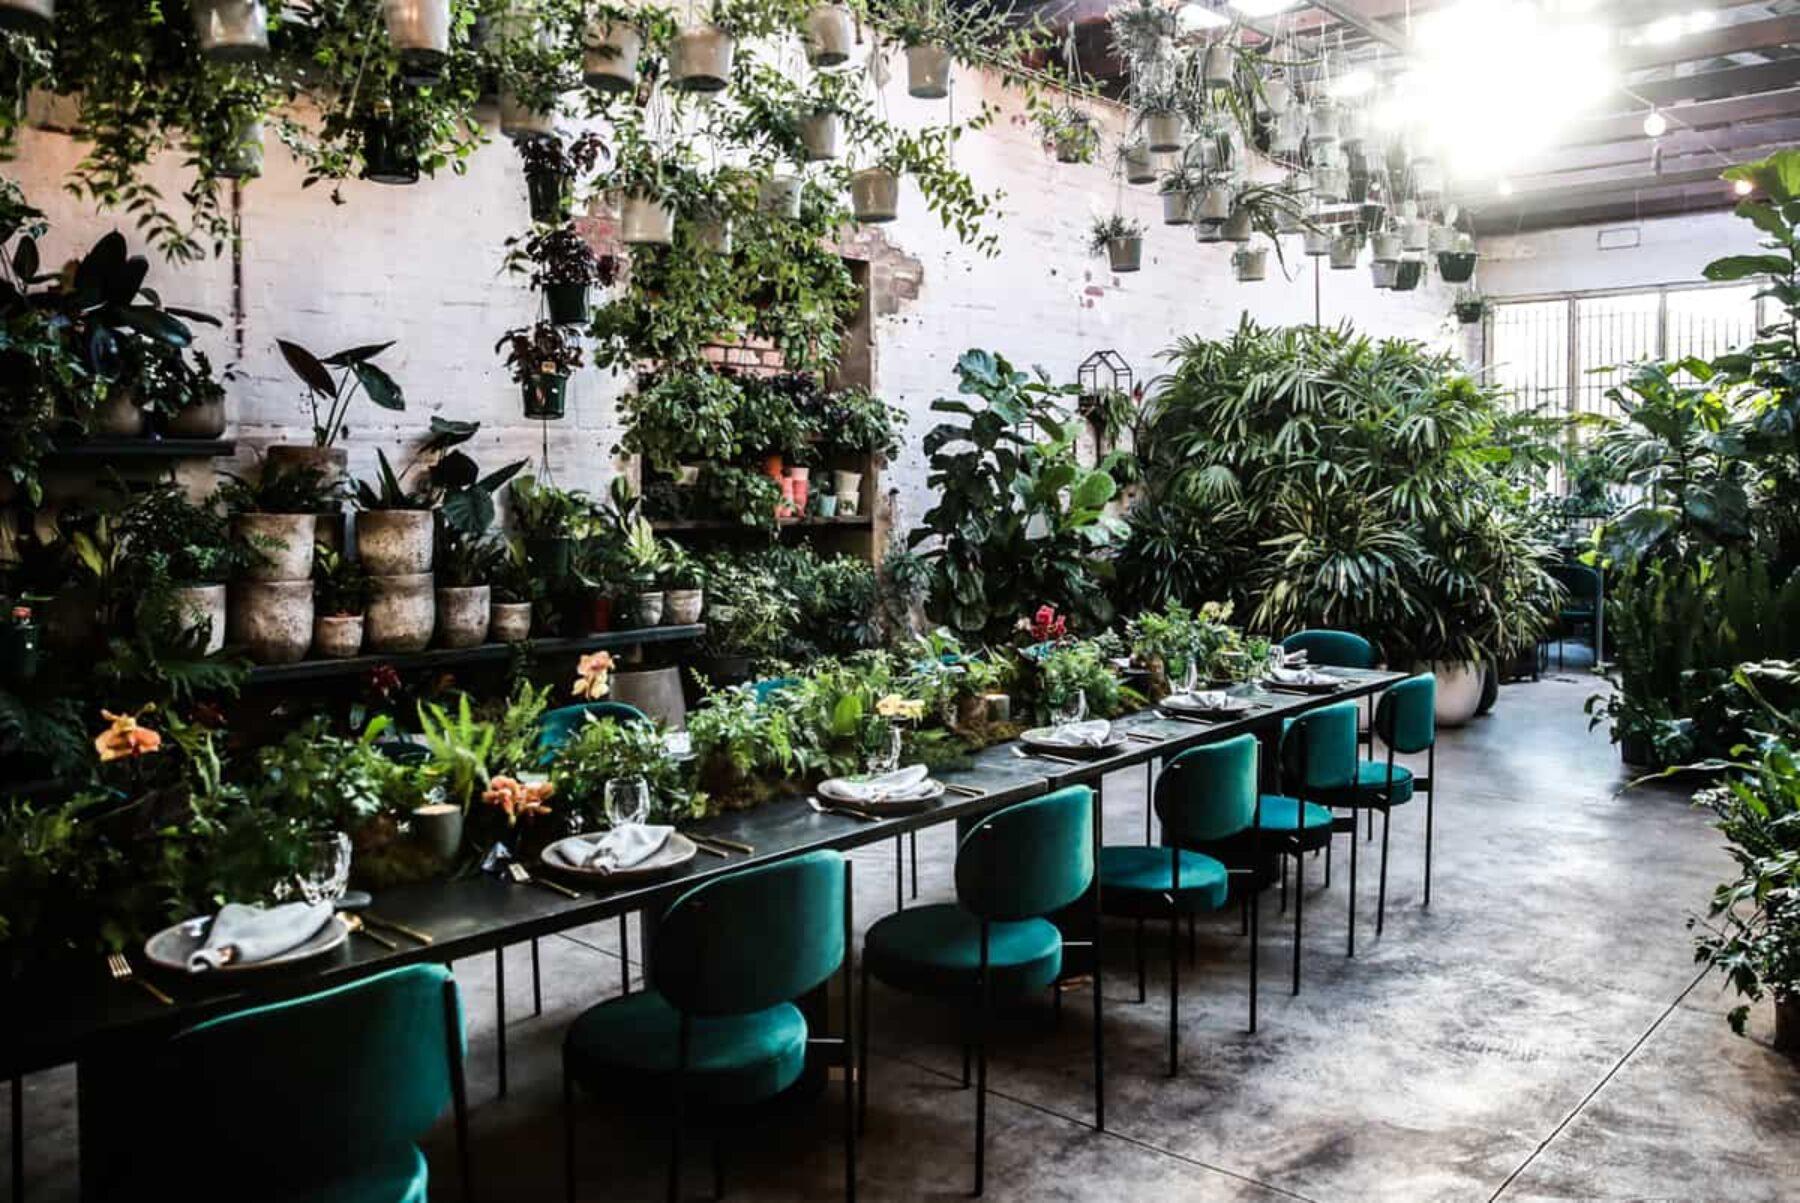 modern furniture and prop hire in Melbourne - Dann Event Hire